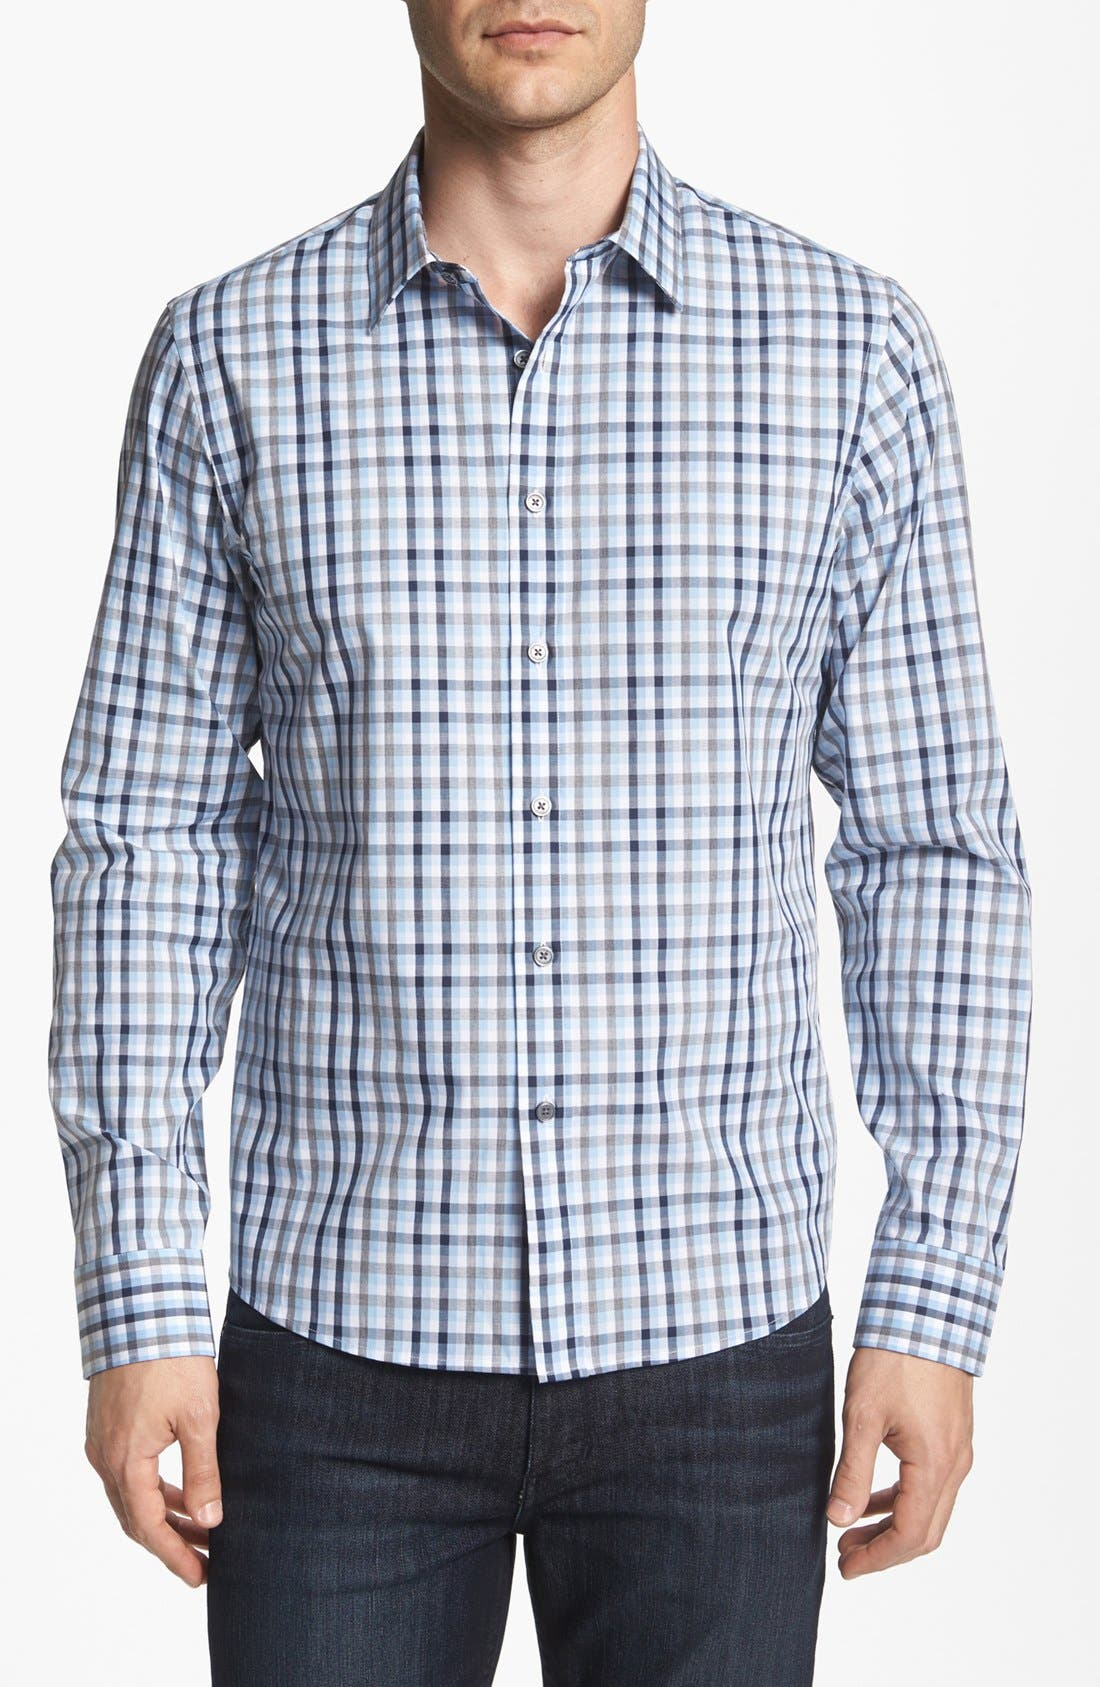 Alternate Image 1 Selected - Michael Kors Regular Fit Sport Shirt